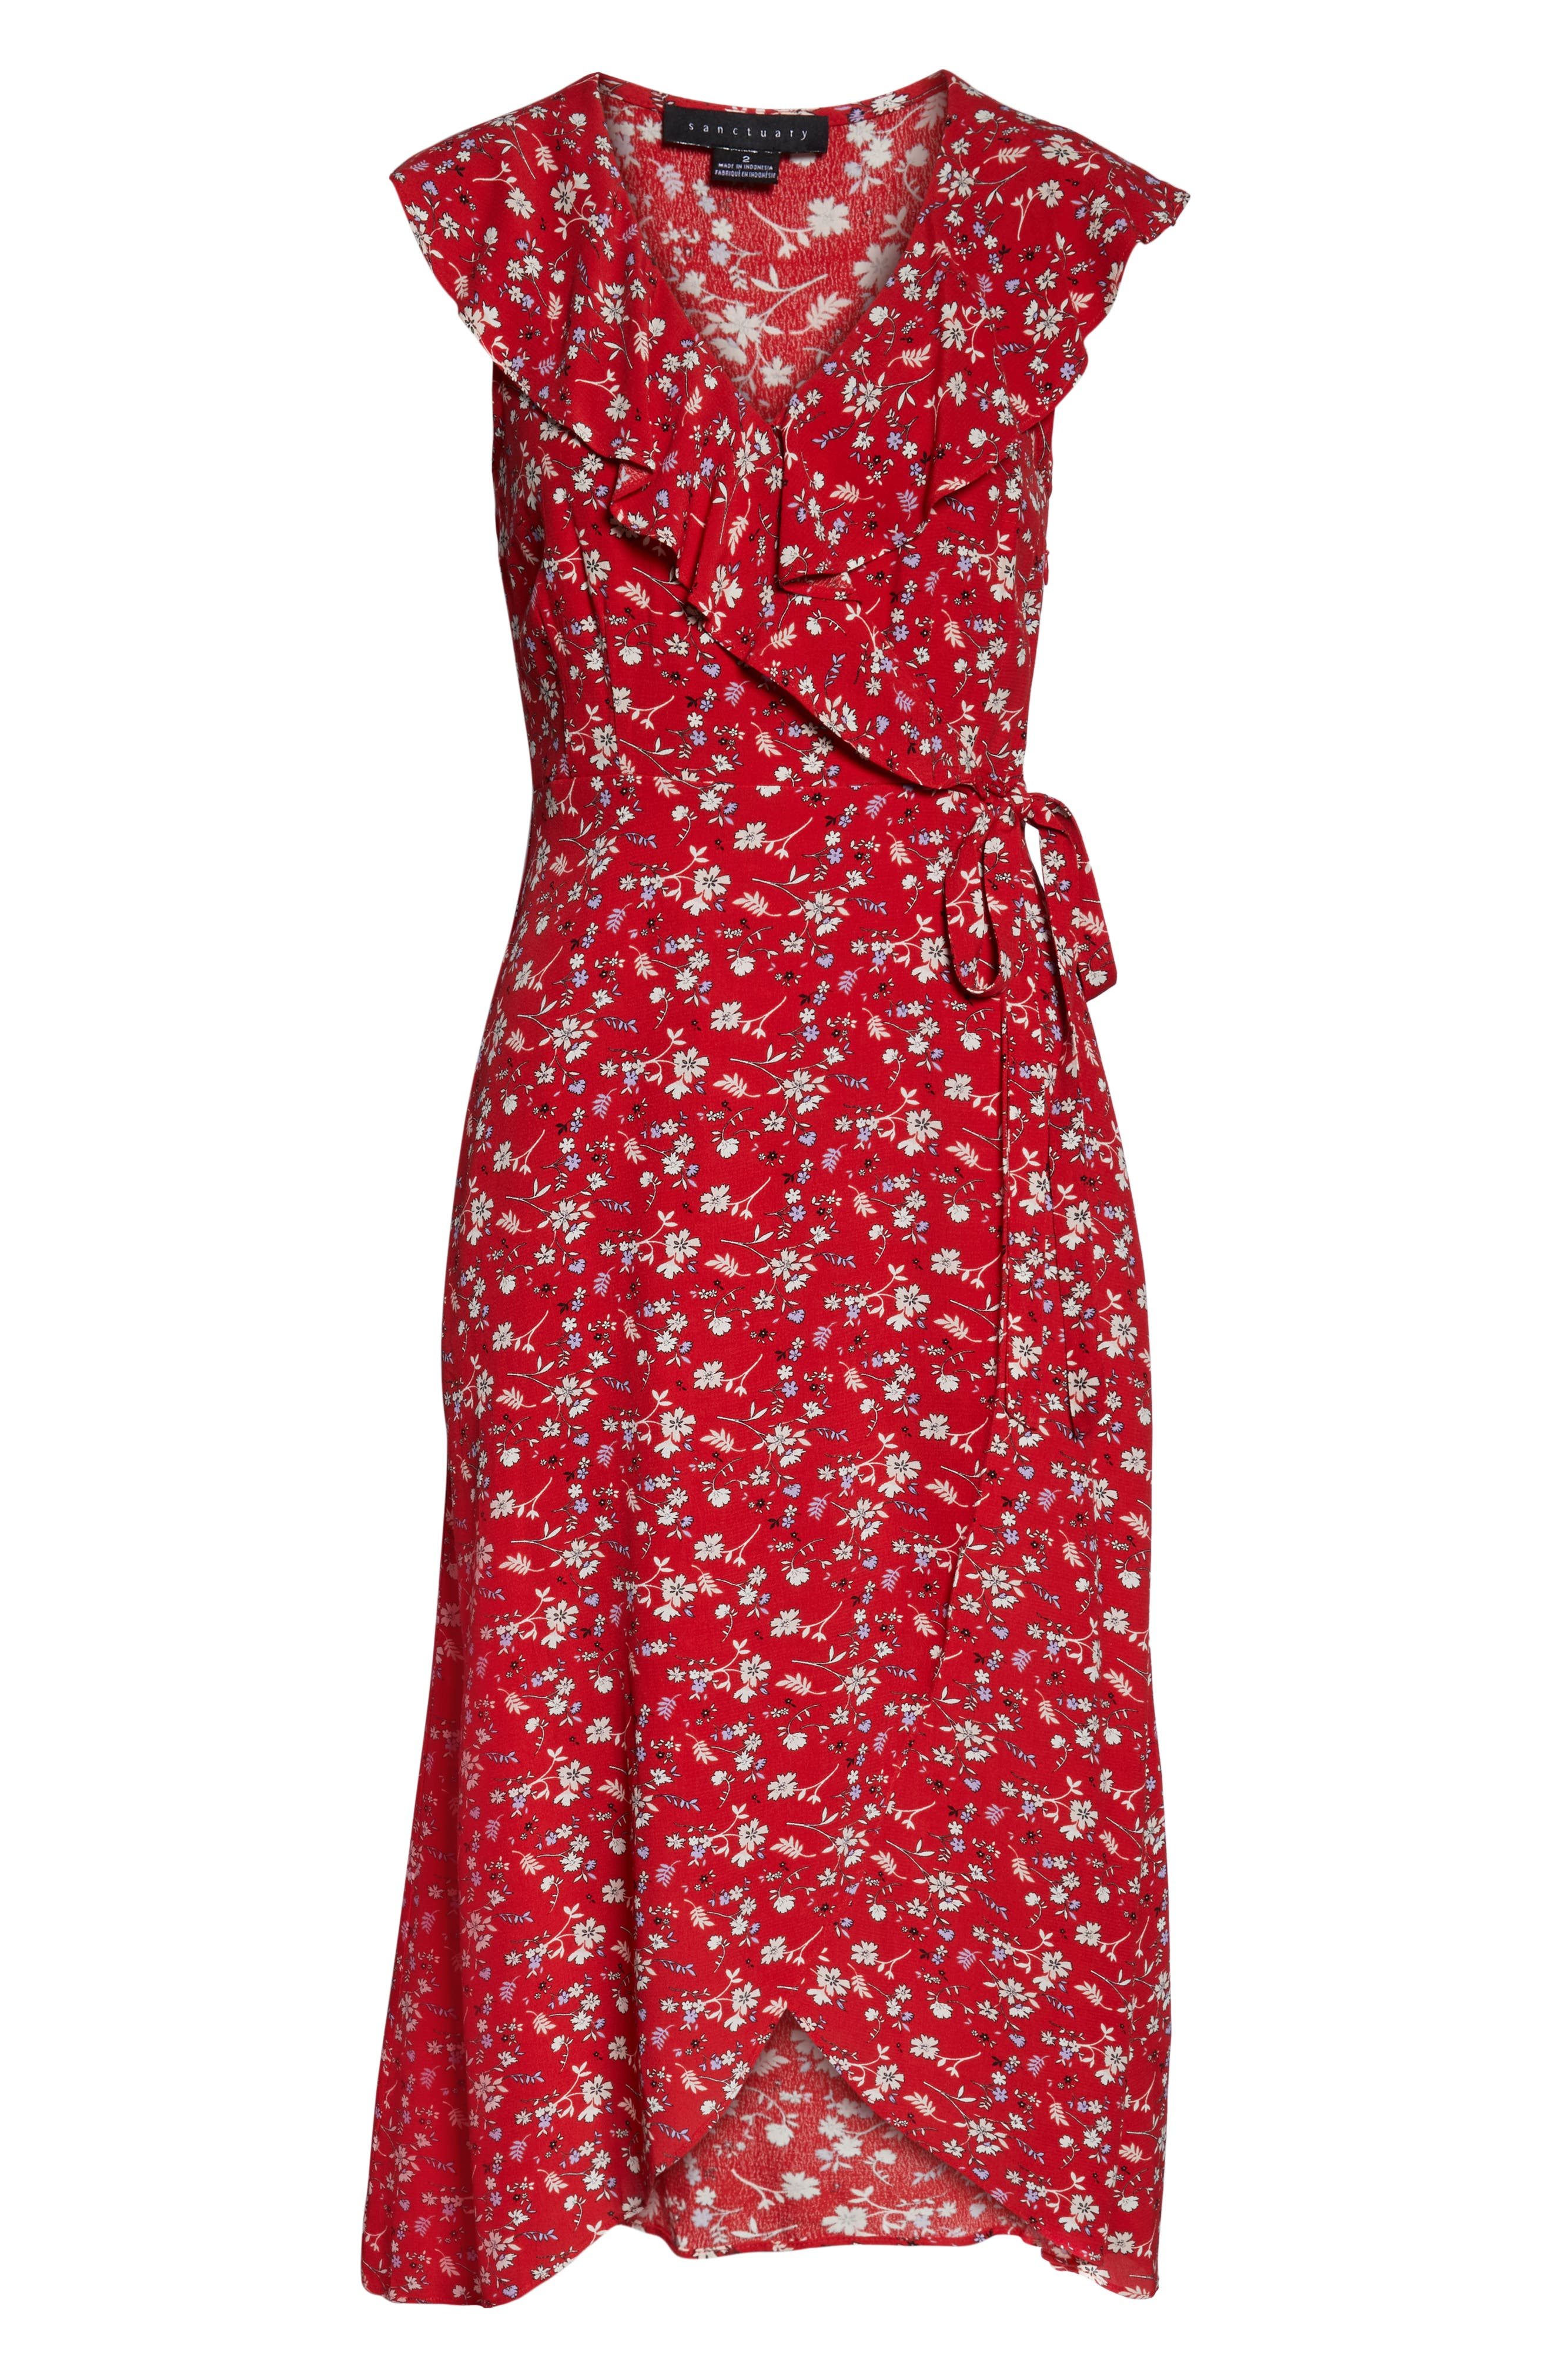 SANCTUARY, Jolynn Faux Wrap Midi Dress, Alternate thumbnail 5, color, SIMPLY RED